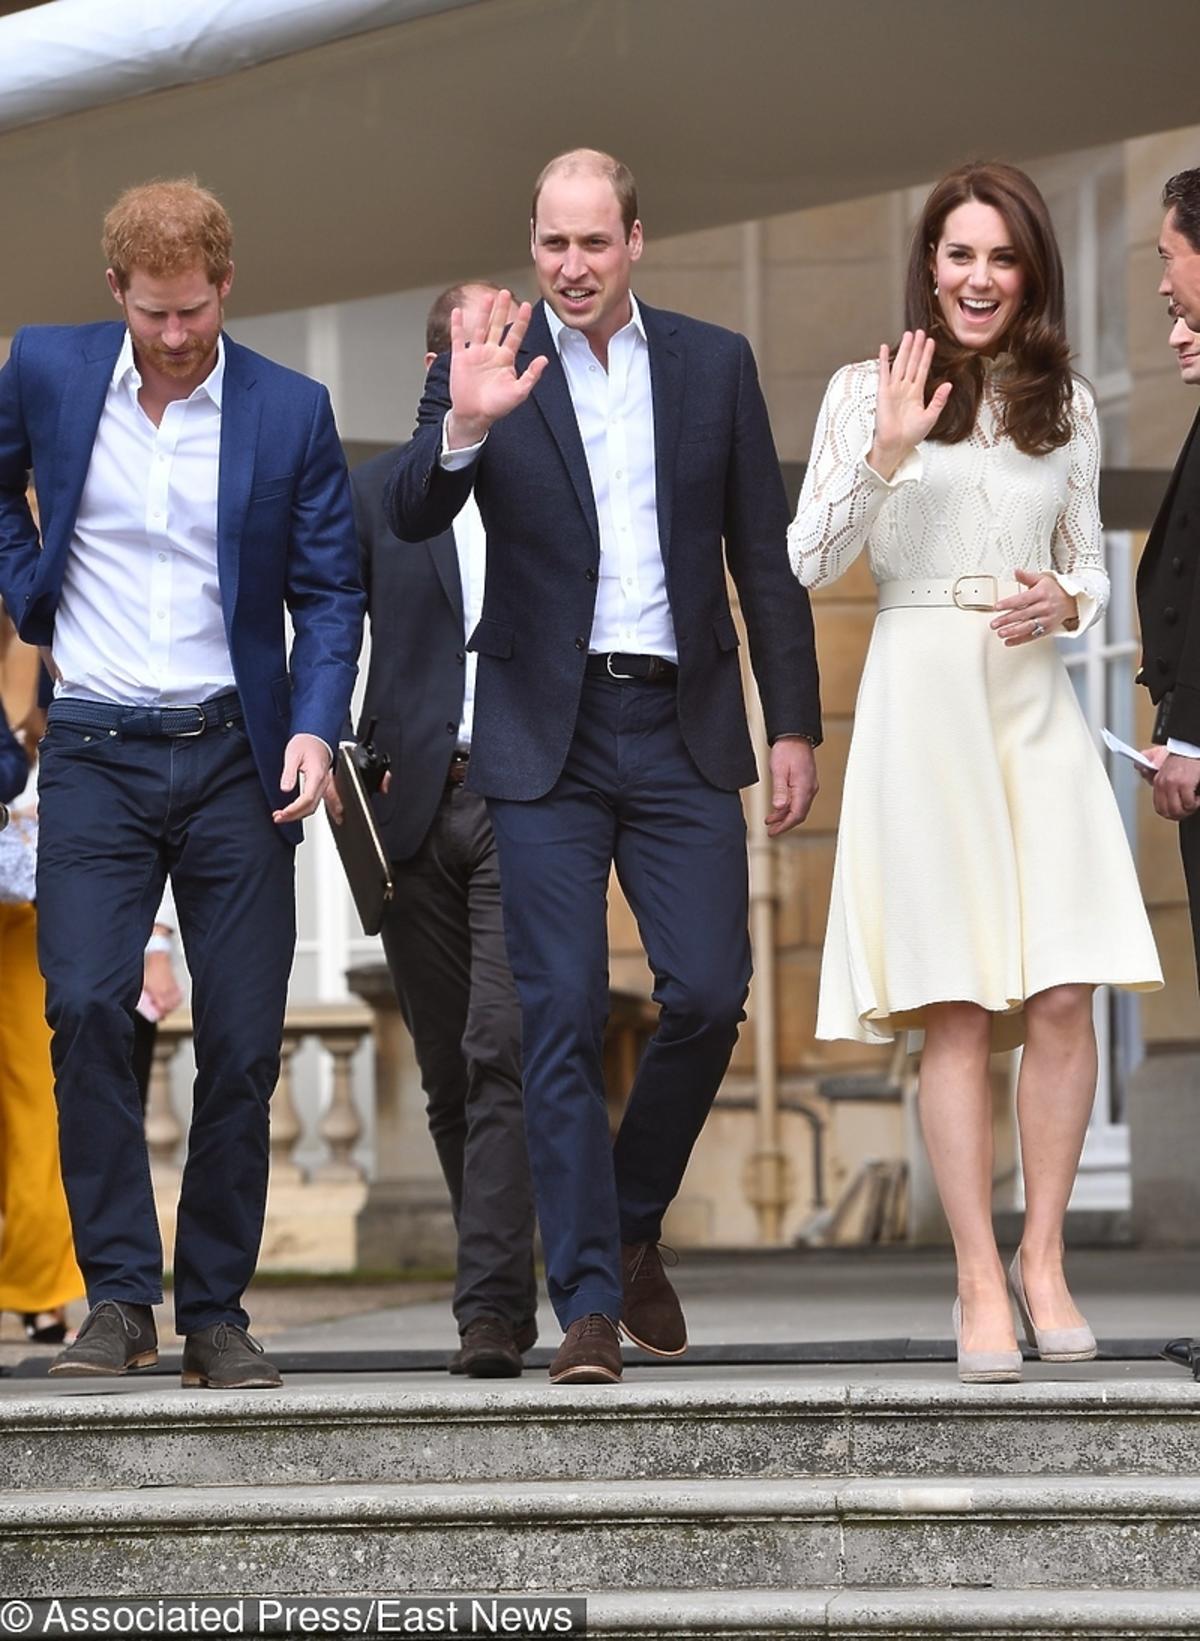 książę Harry, książę William, księżna Kate